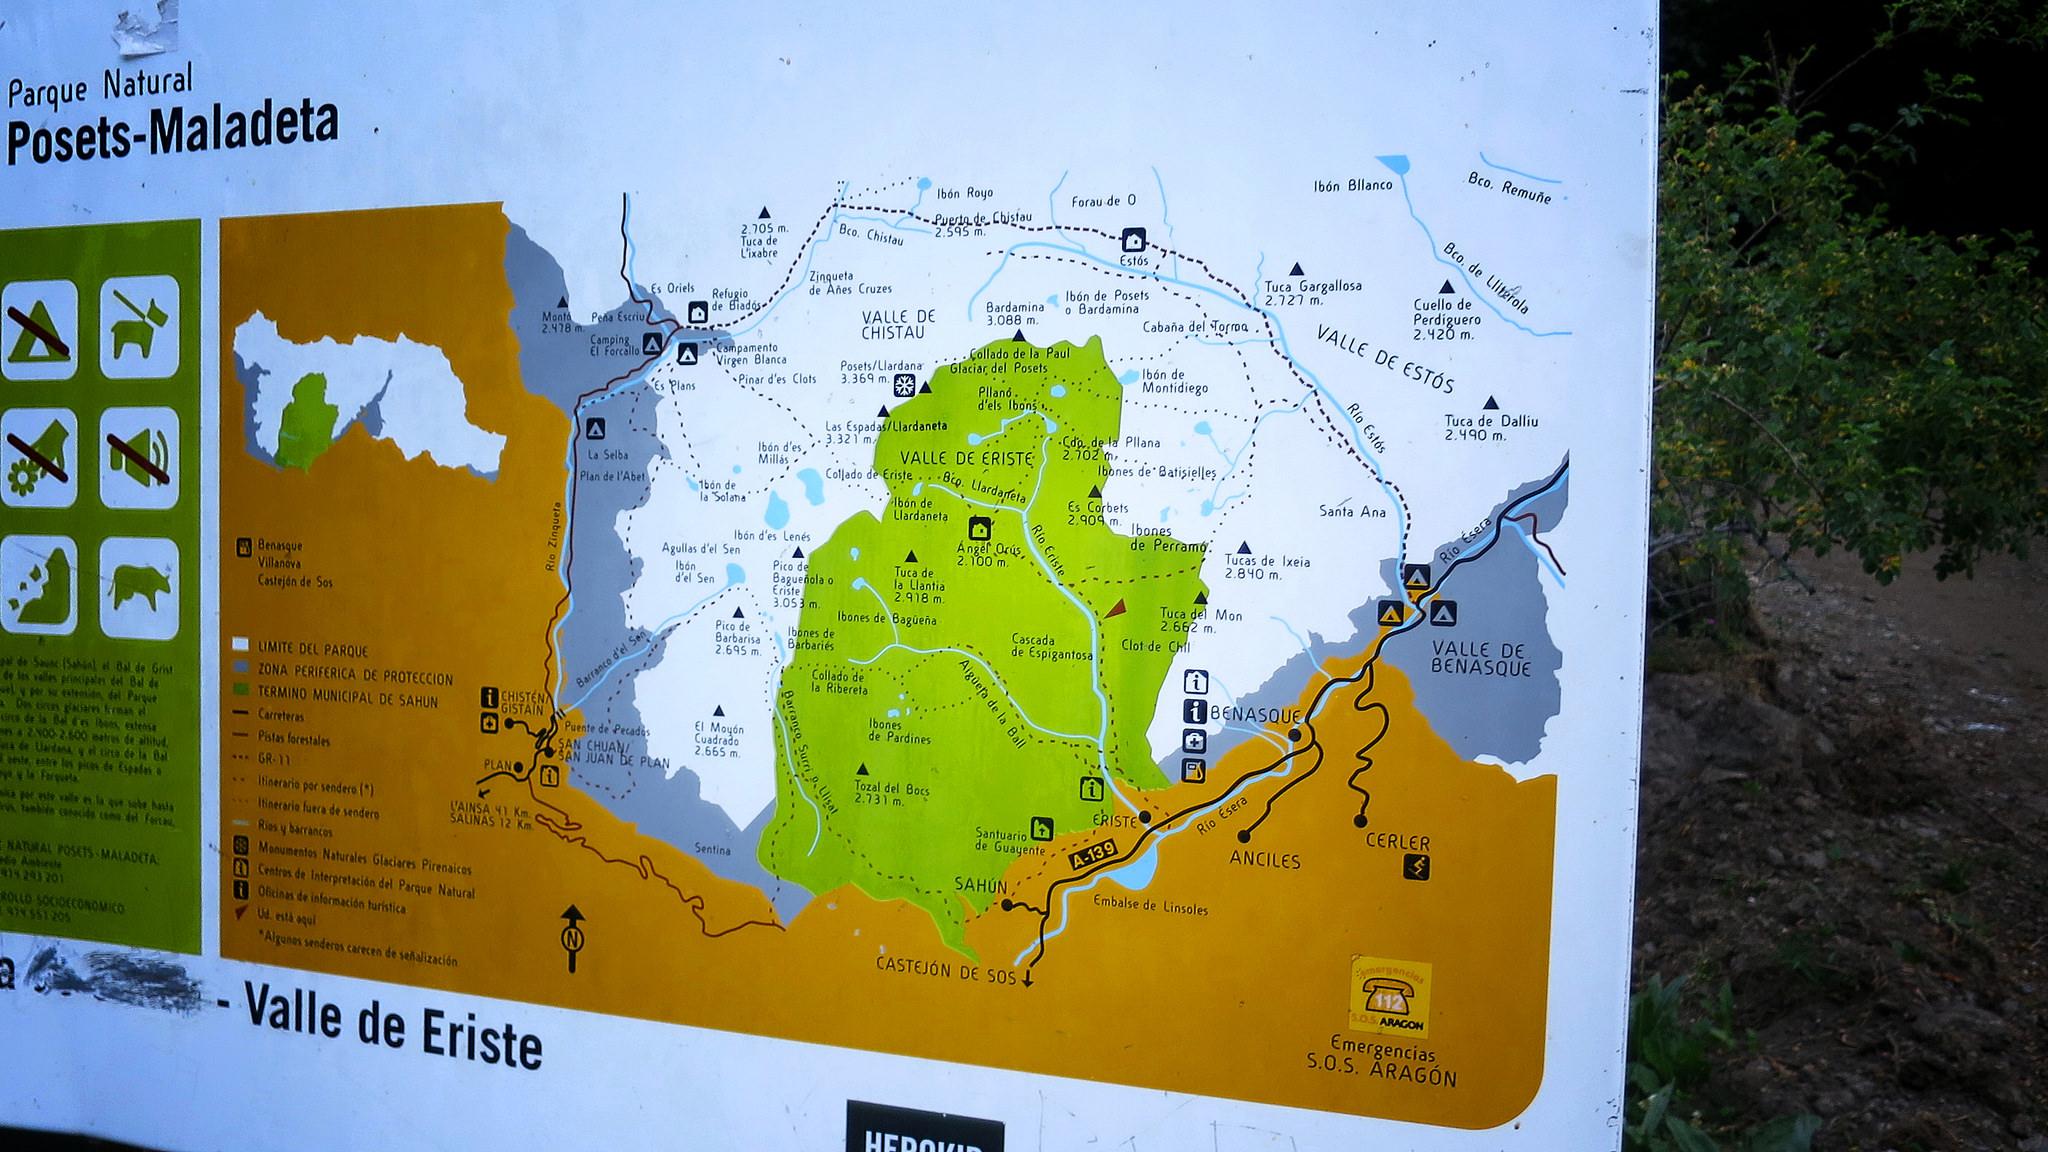 valle de Eriste mapa - https://www.flickr.com/photos/wenceslaugraus/